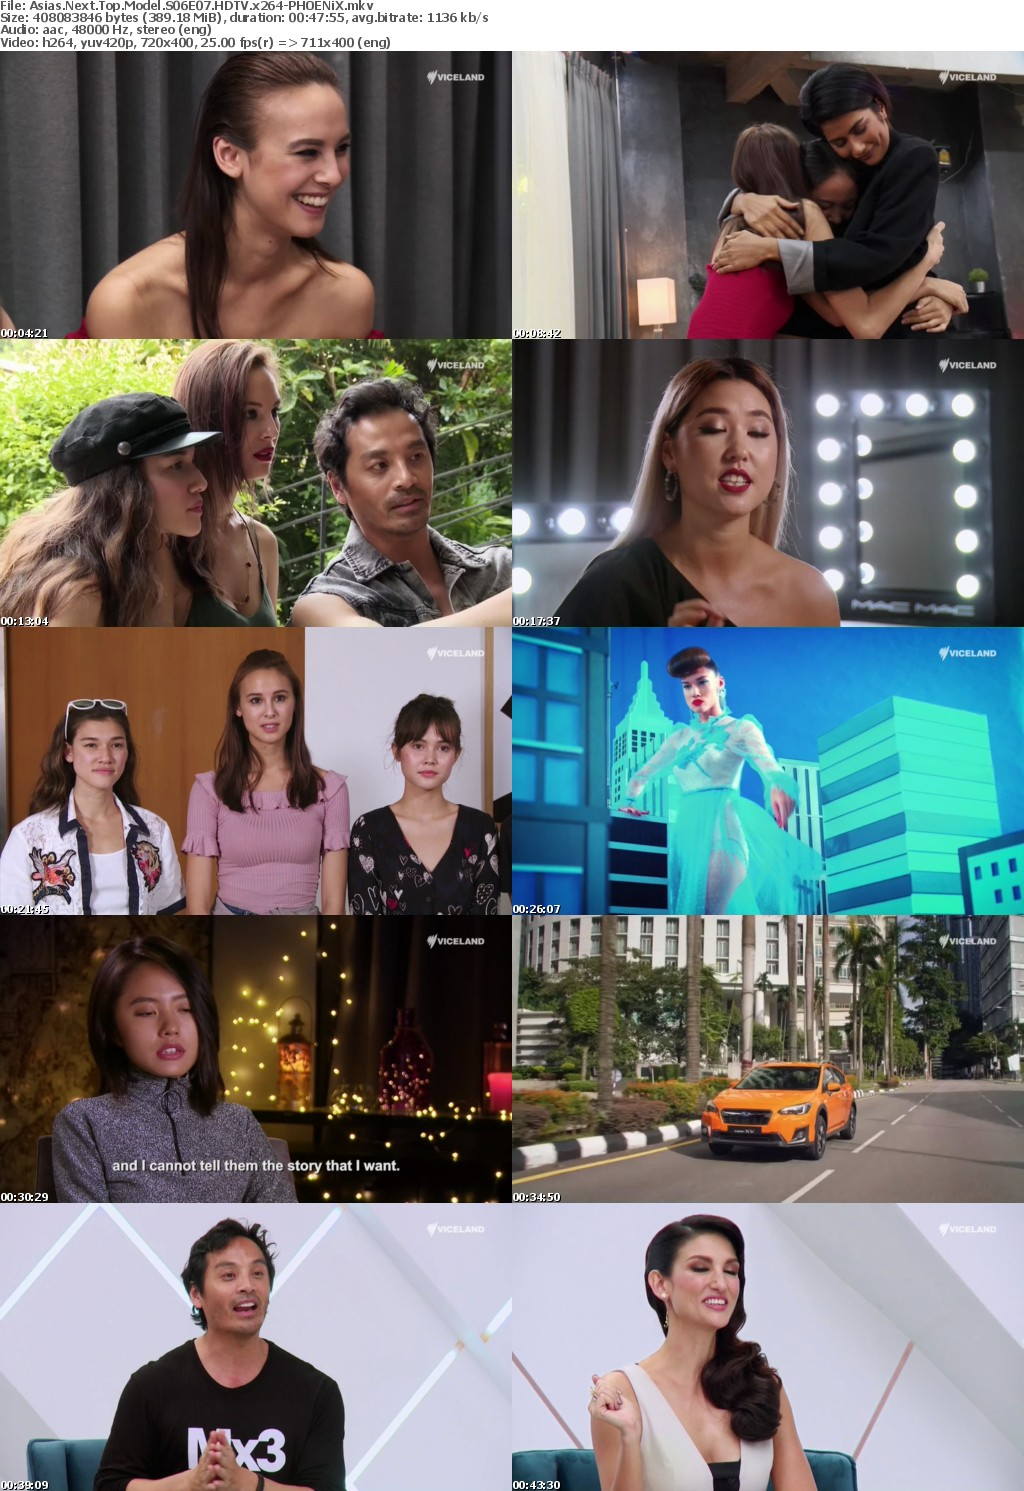 Asias Next Top Model S06E07 HDTV x264-PHOENiX